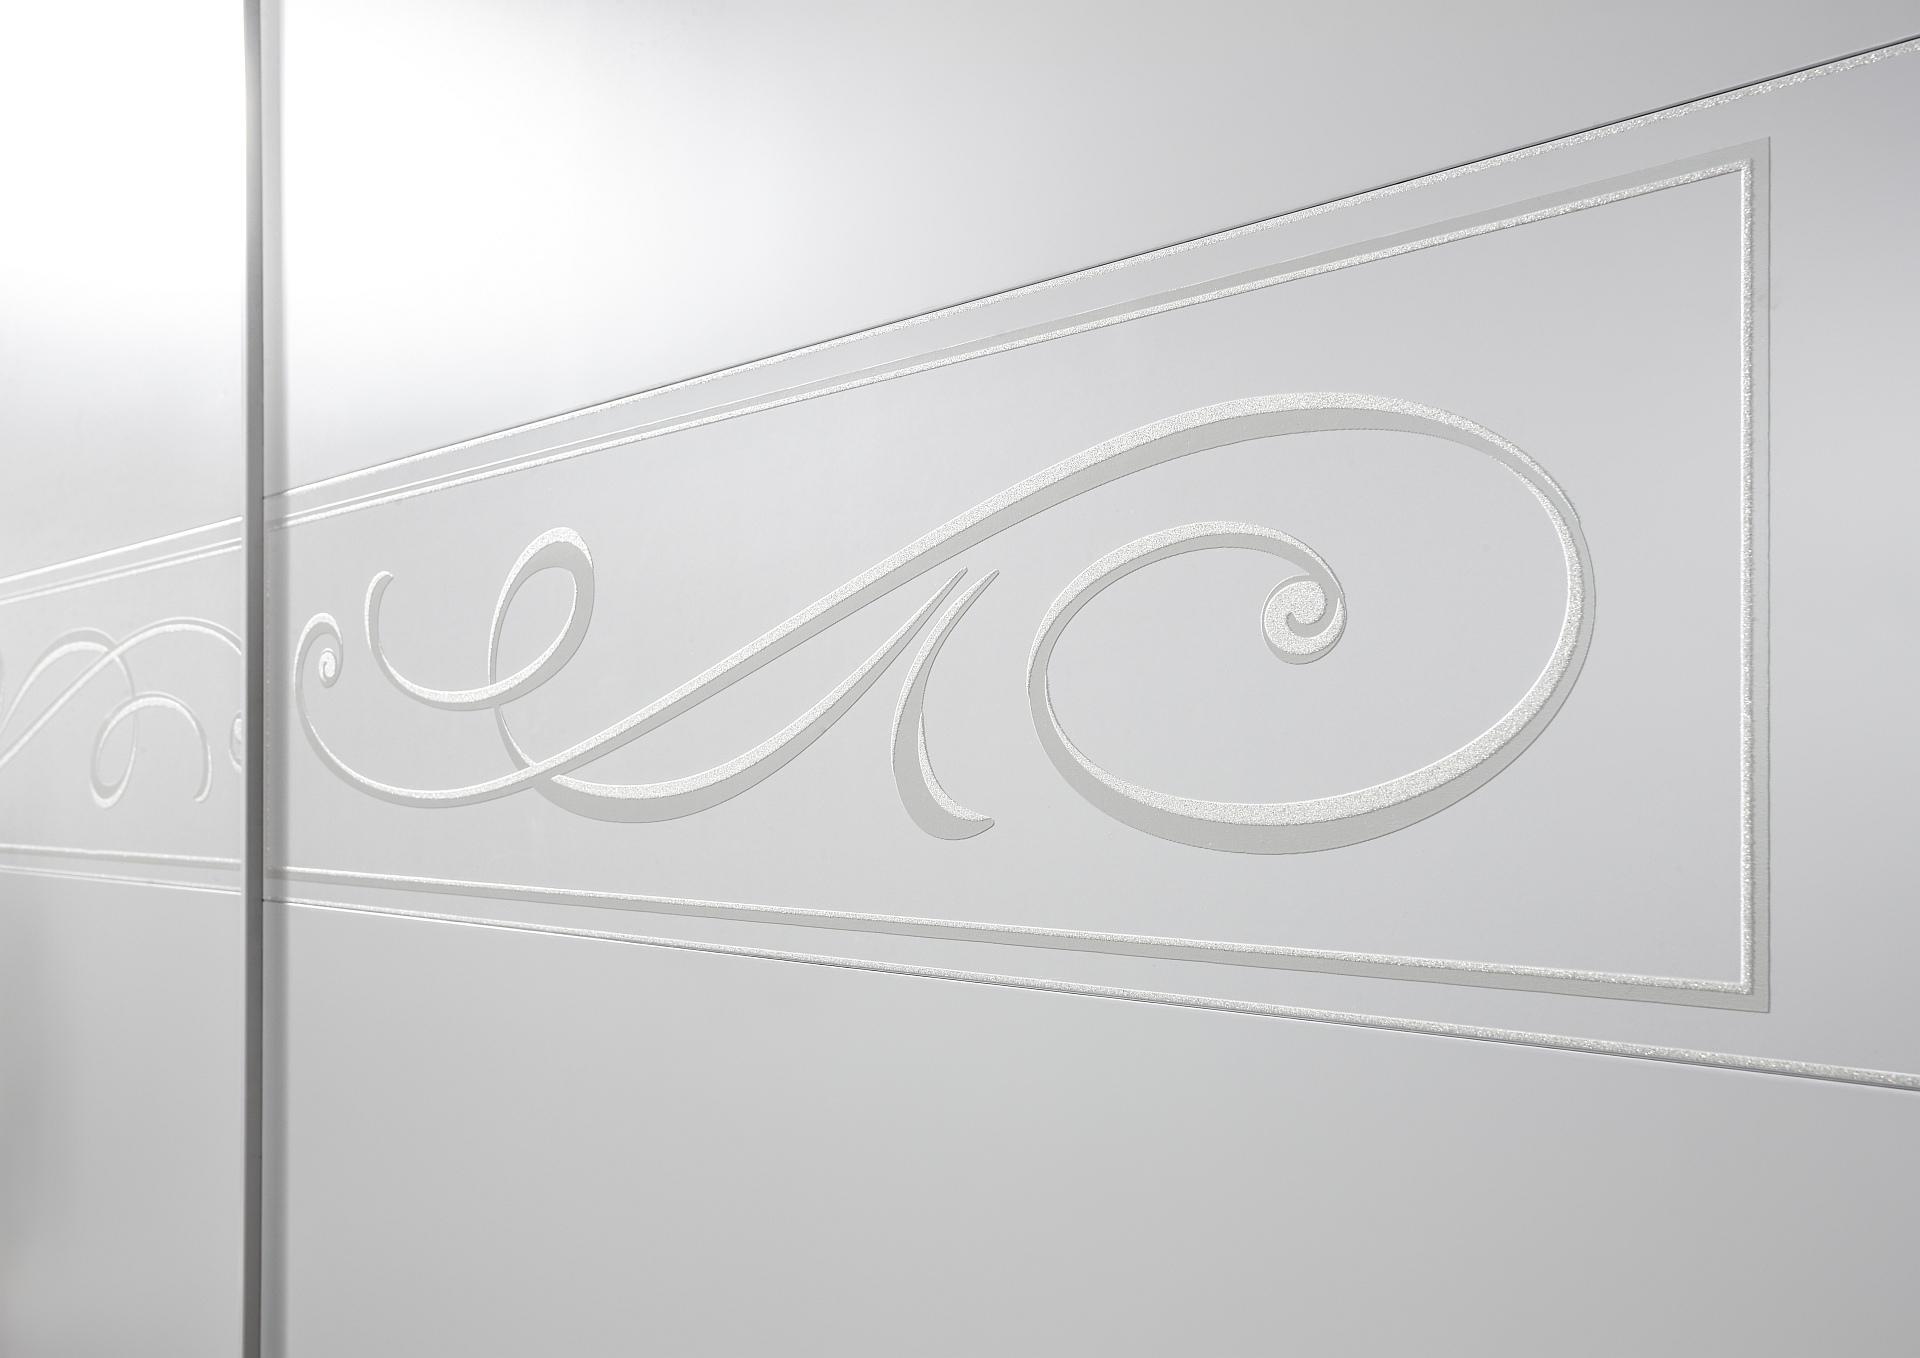 Elisir SZ 2 KS Detail LQ